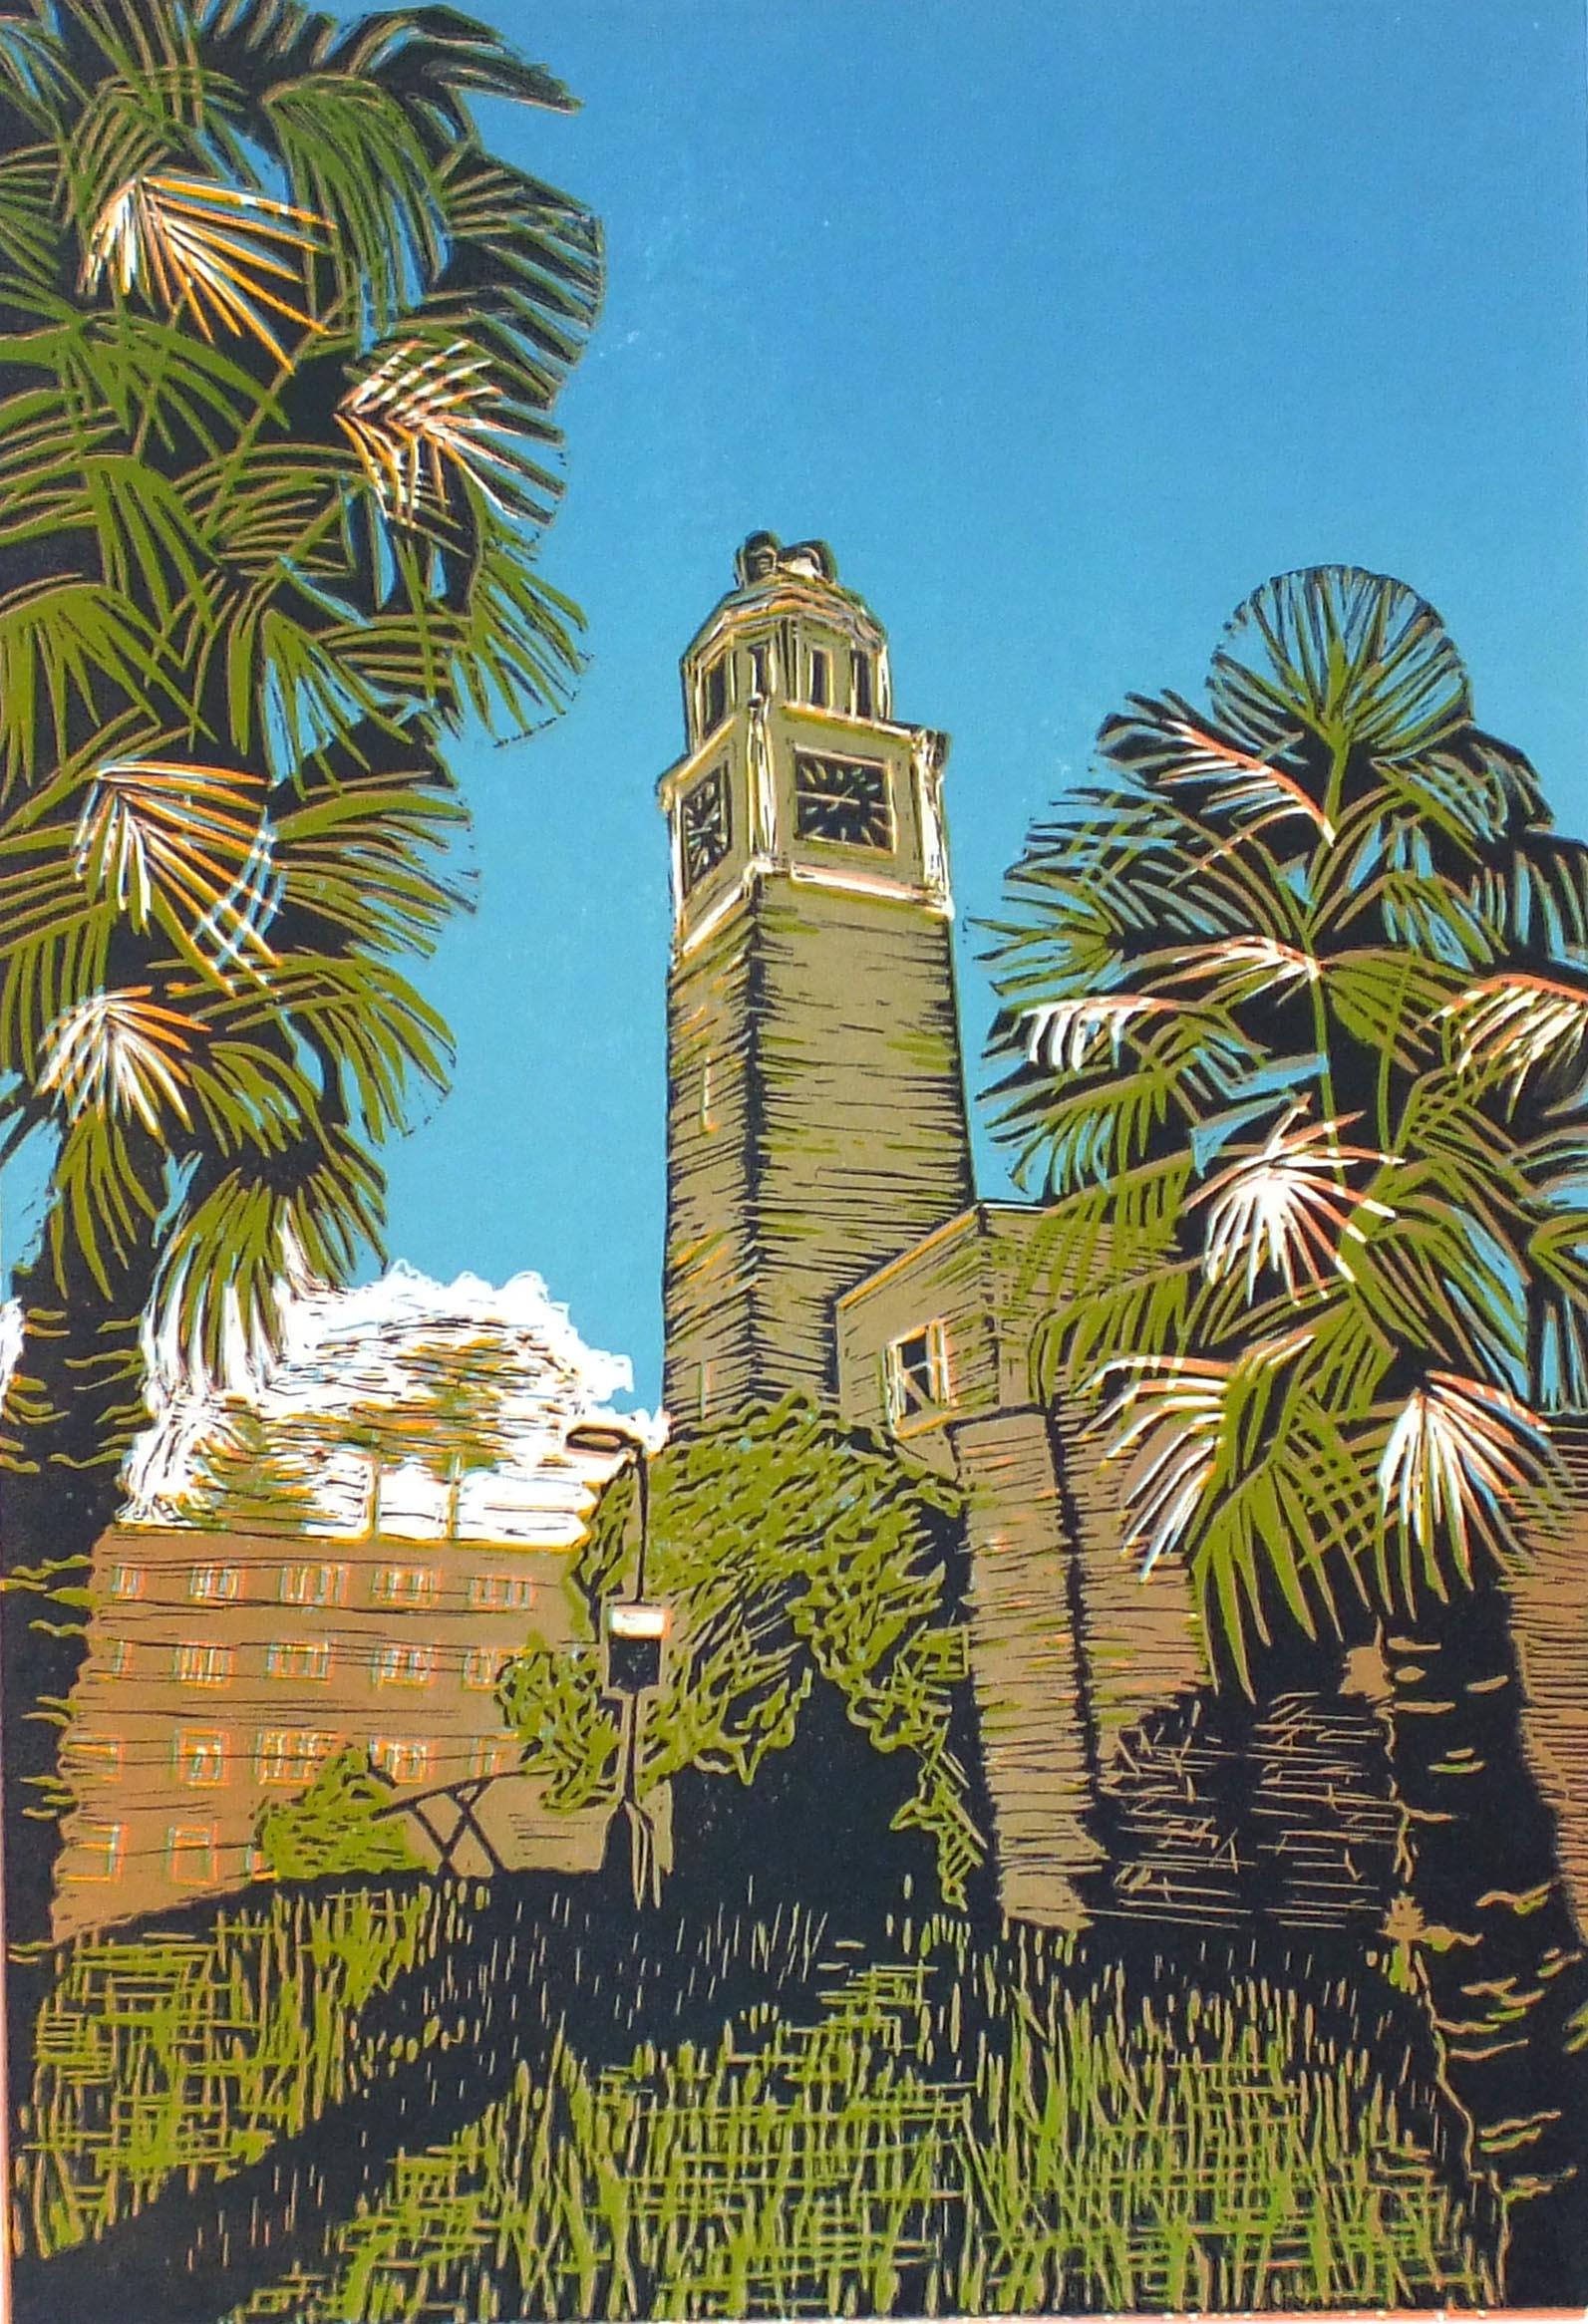 Clock tower #7 image.jpg